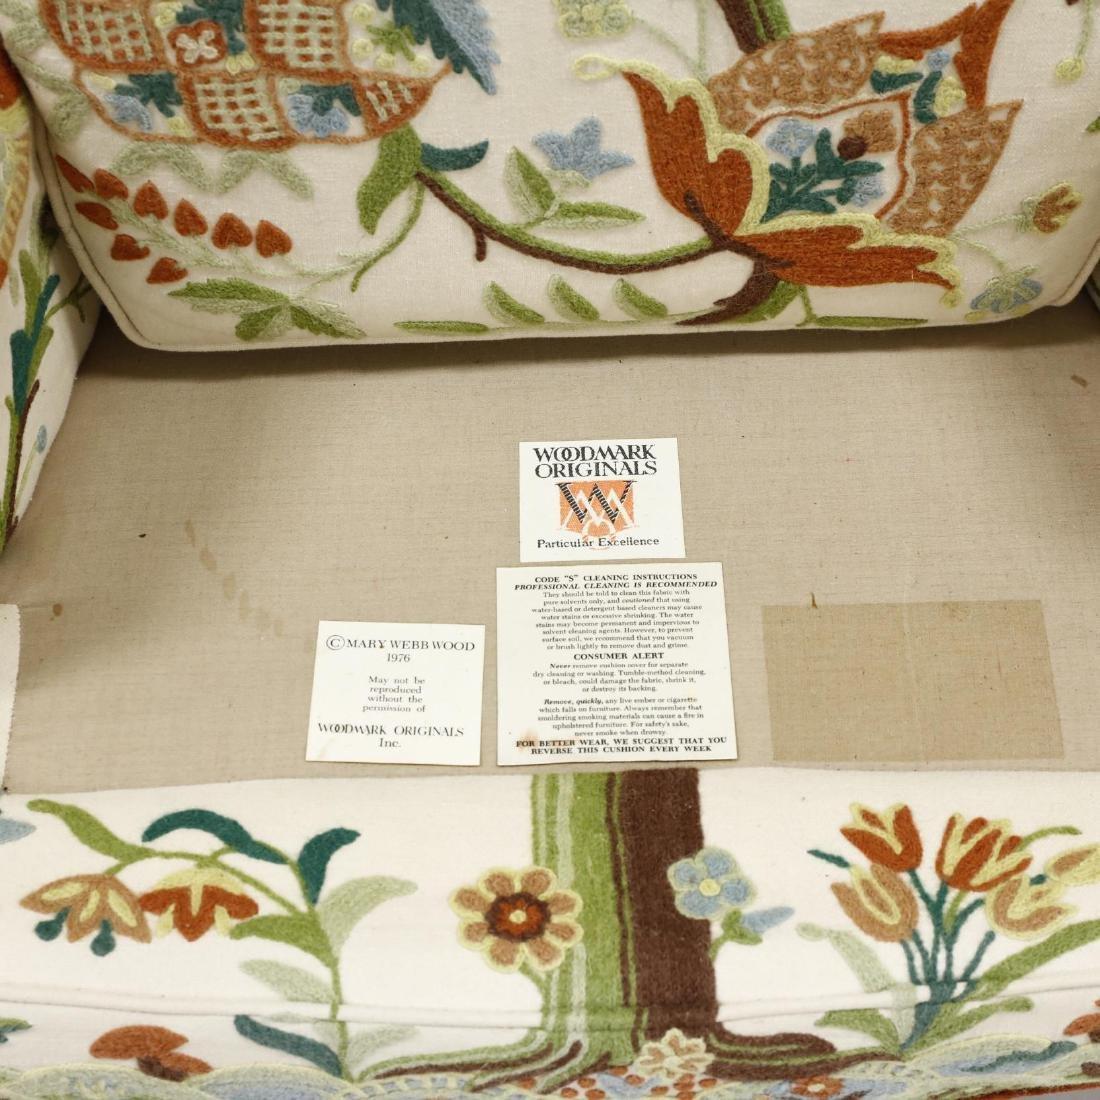 Woodmark Originals, Pair of Crewelwork Upholstered Wing - 3